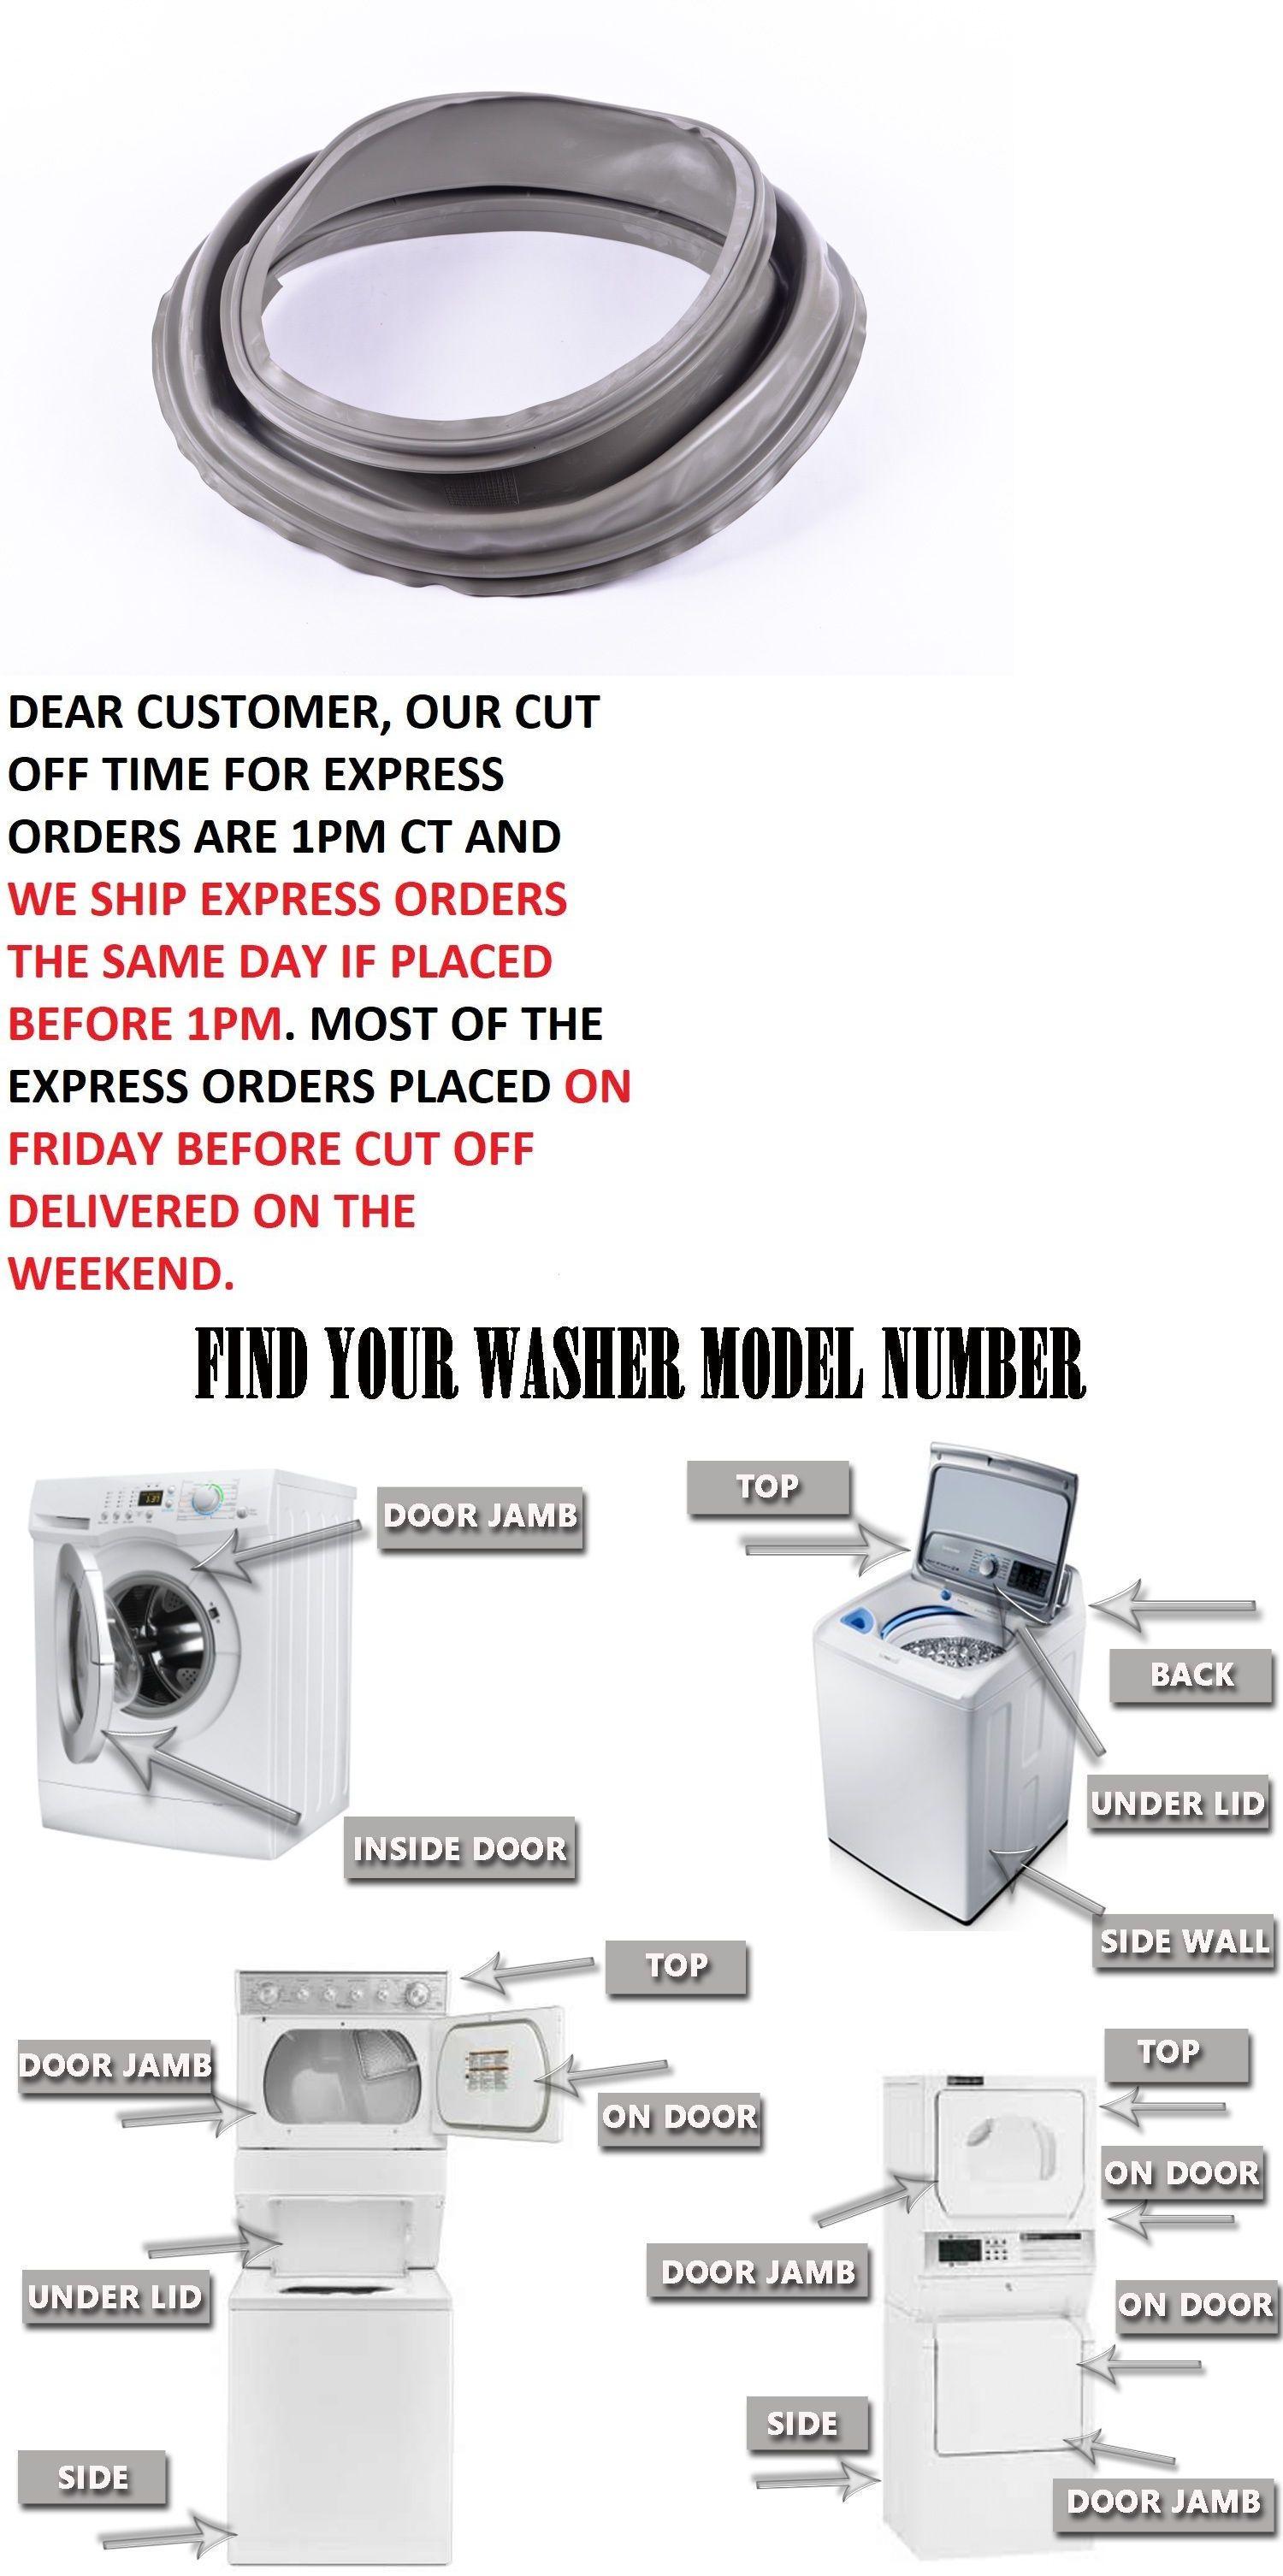 Sealpro Washer Door Gasket For Whirlpool W10111435 8540952 W10178959 W10181962 Whirlpool Washer Washer Whirlpool